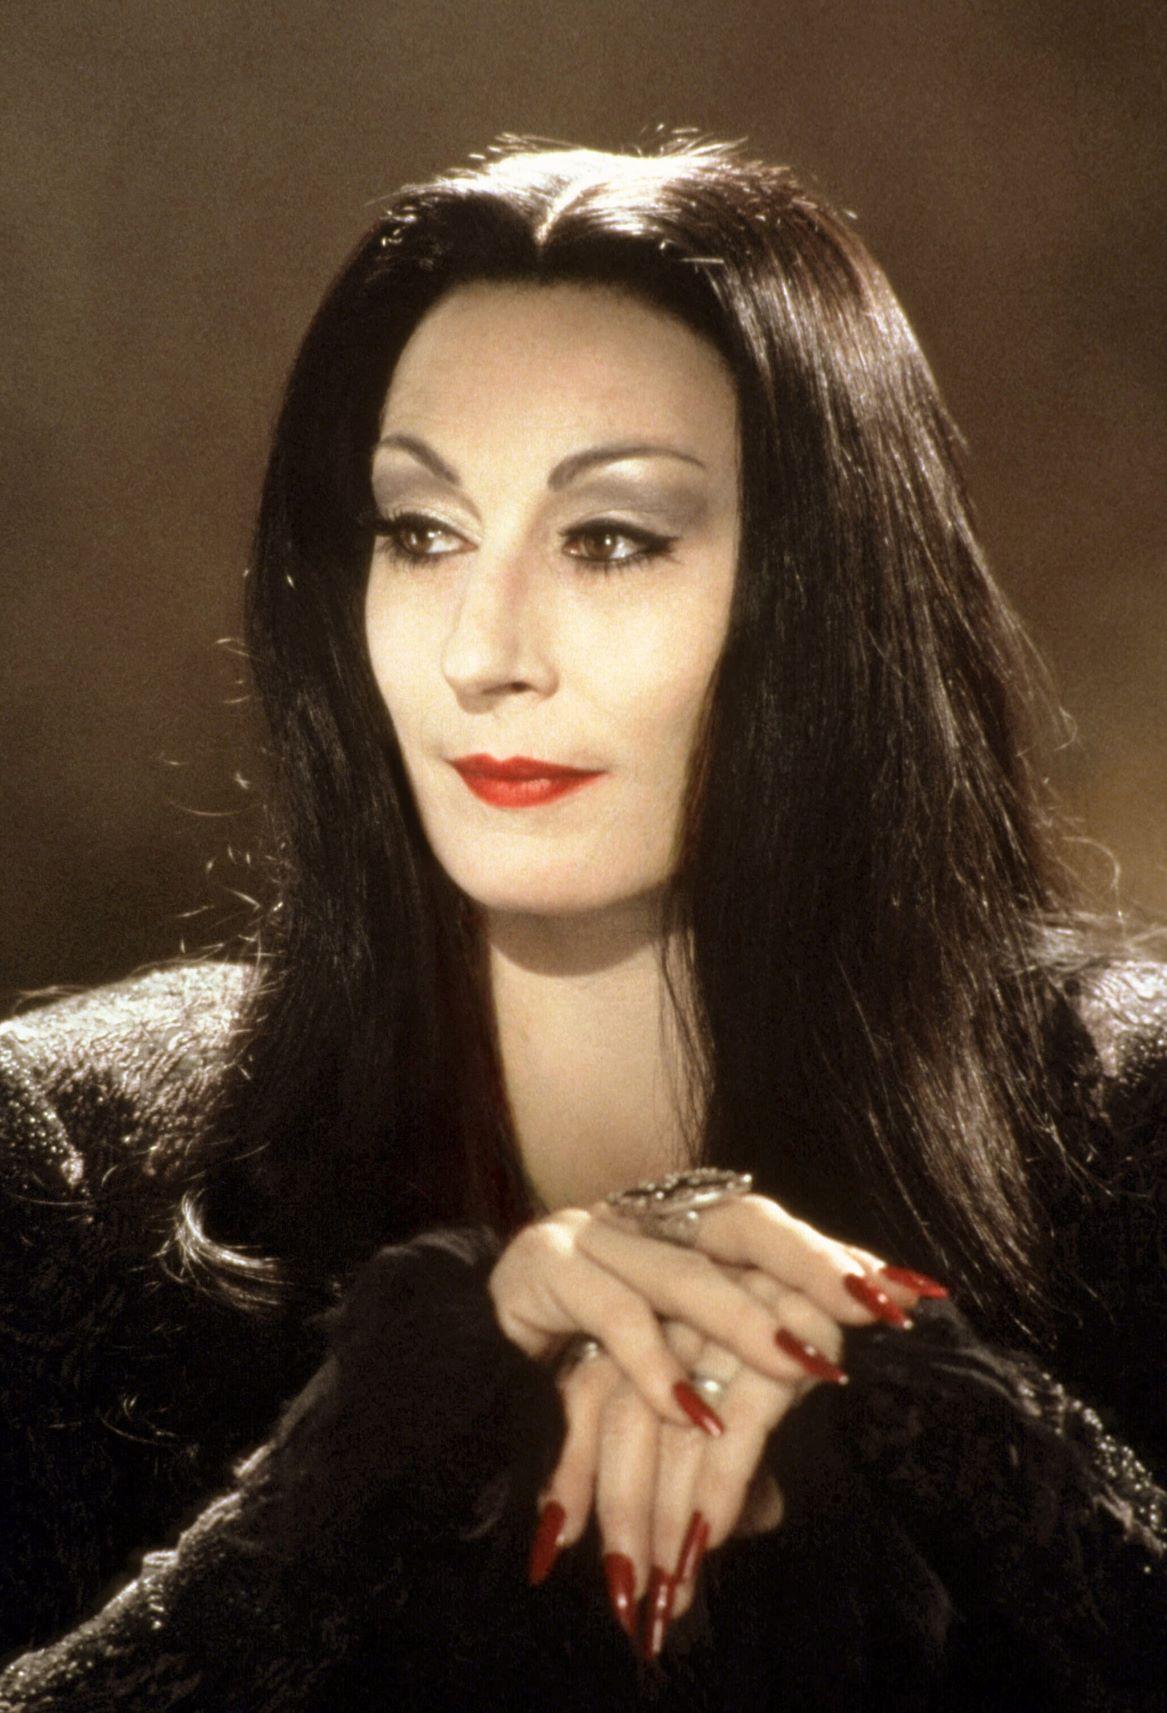 Anjelica-Huston-Morticia-Addams.jpg